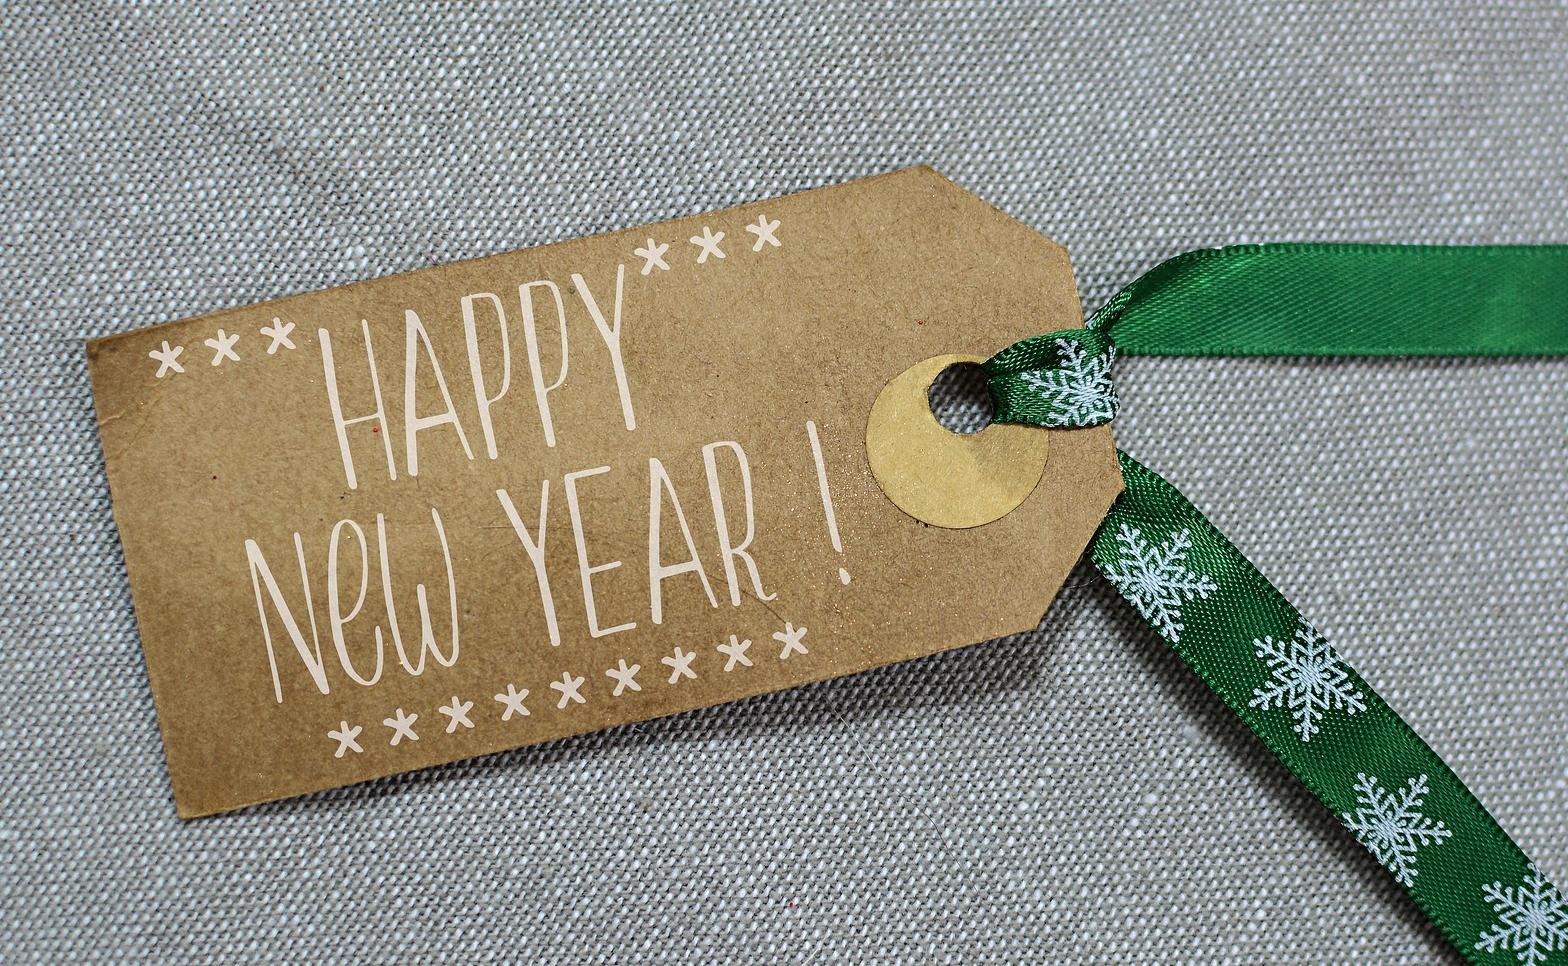 new-year-3012990_1920.jpg